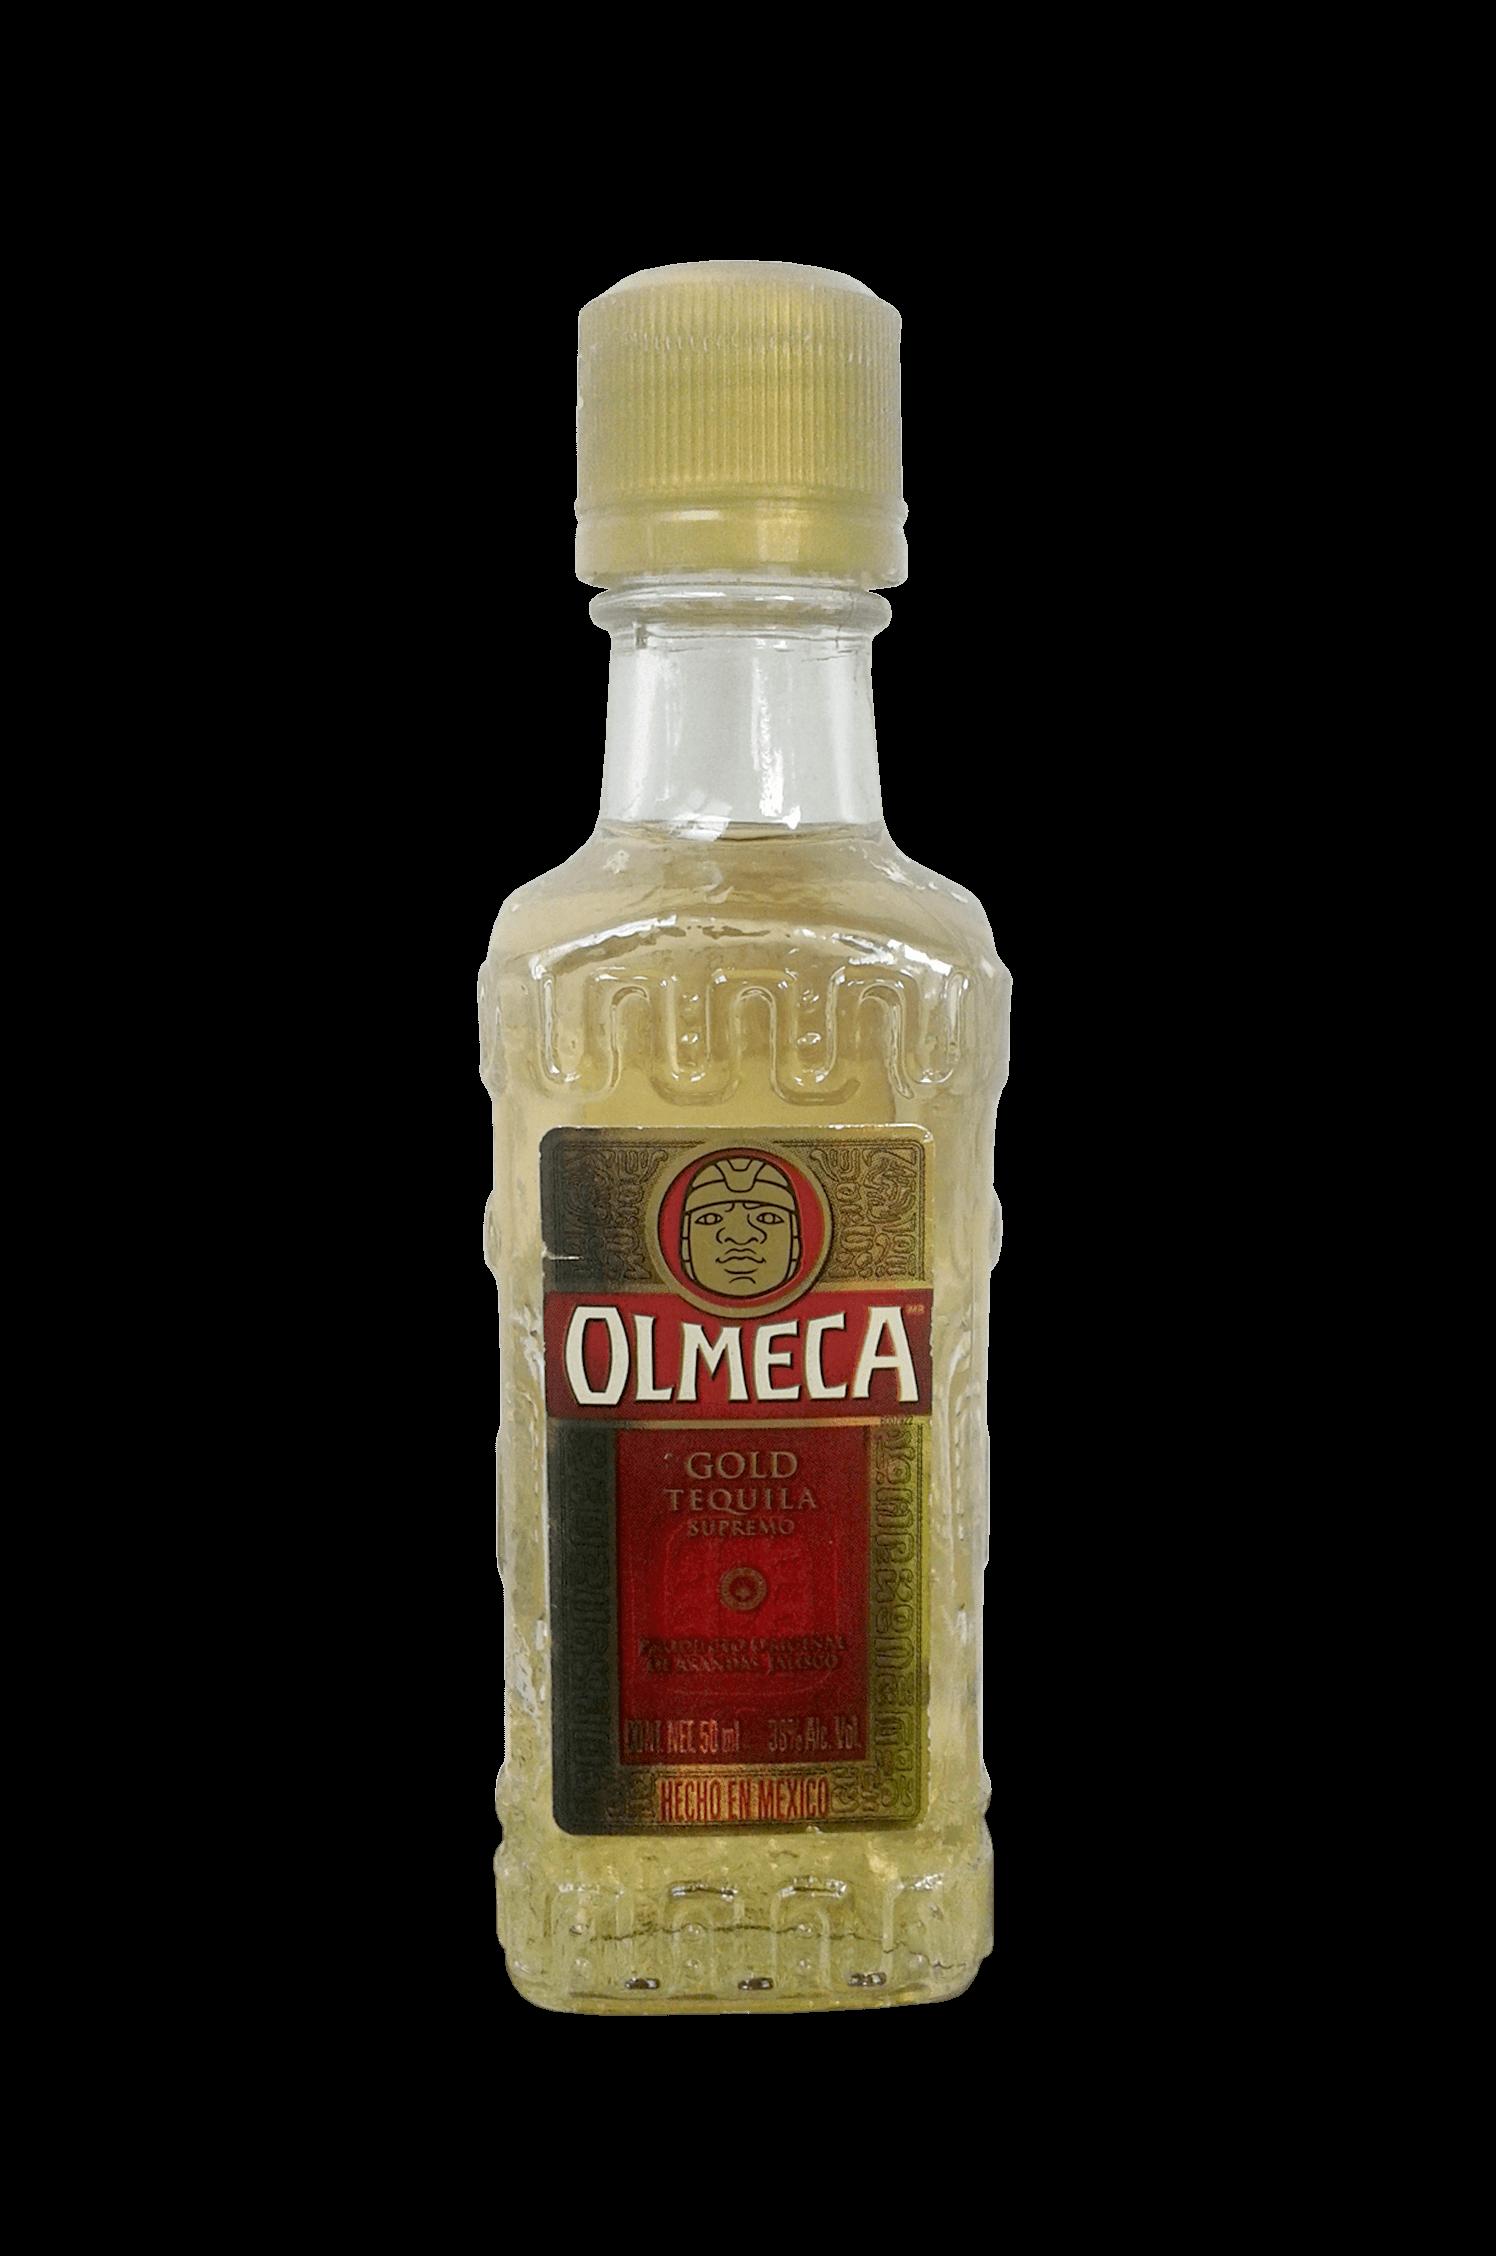 Olmeca Gold Tequila Supremo